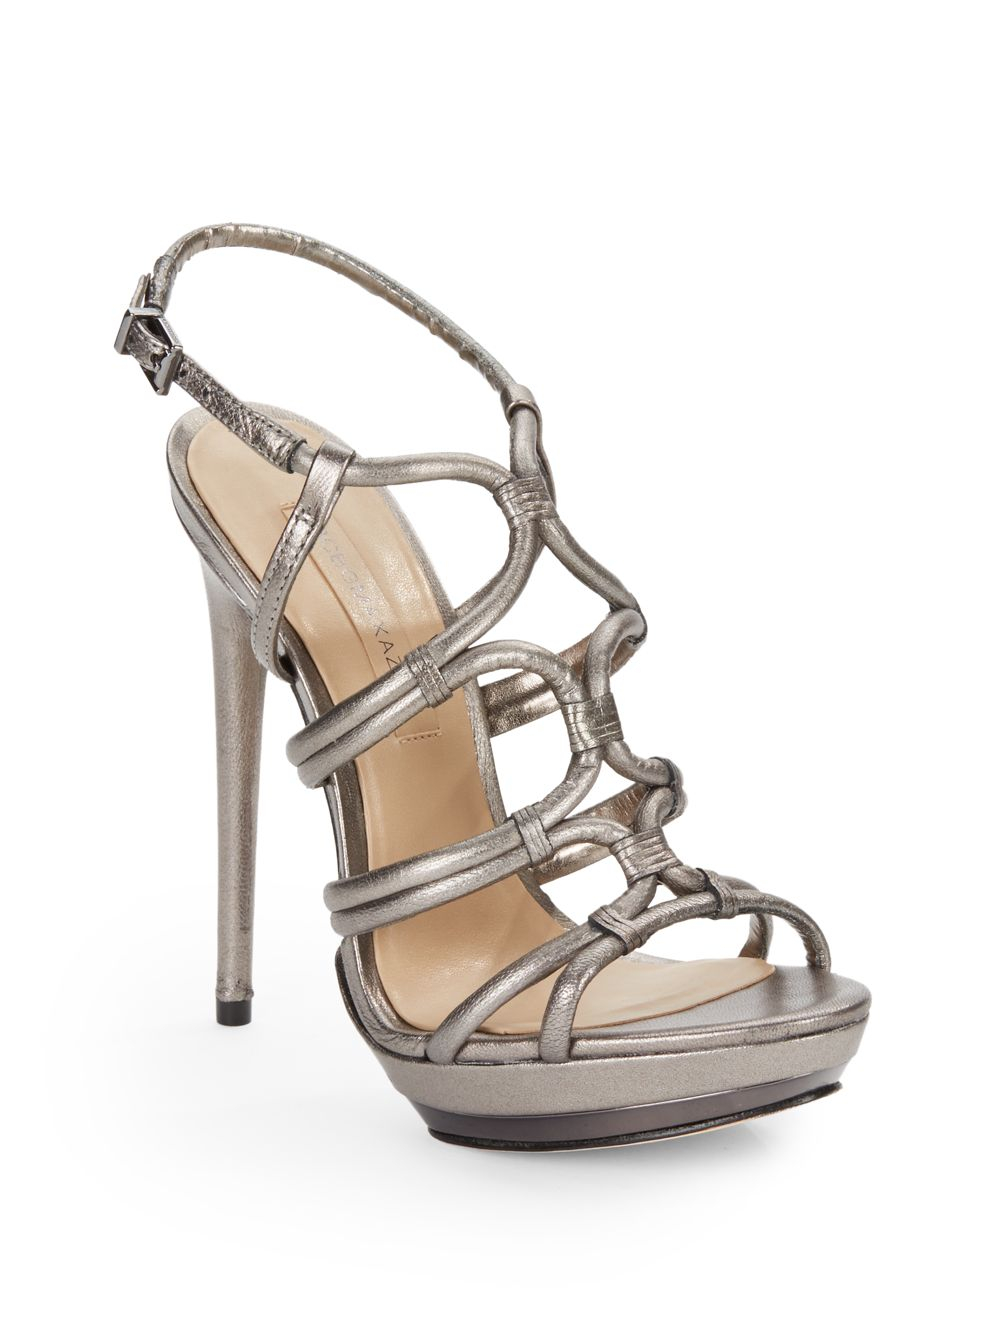 discount in China cheap marketable BCBG Max Azria Metallic Platform Sandals outlet for sale T2eiBcJ